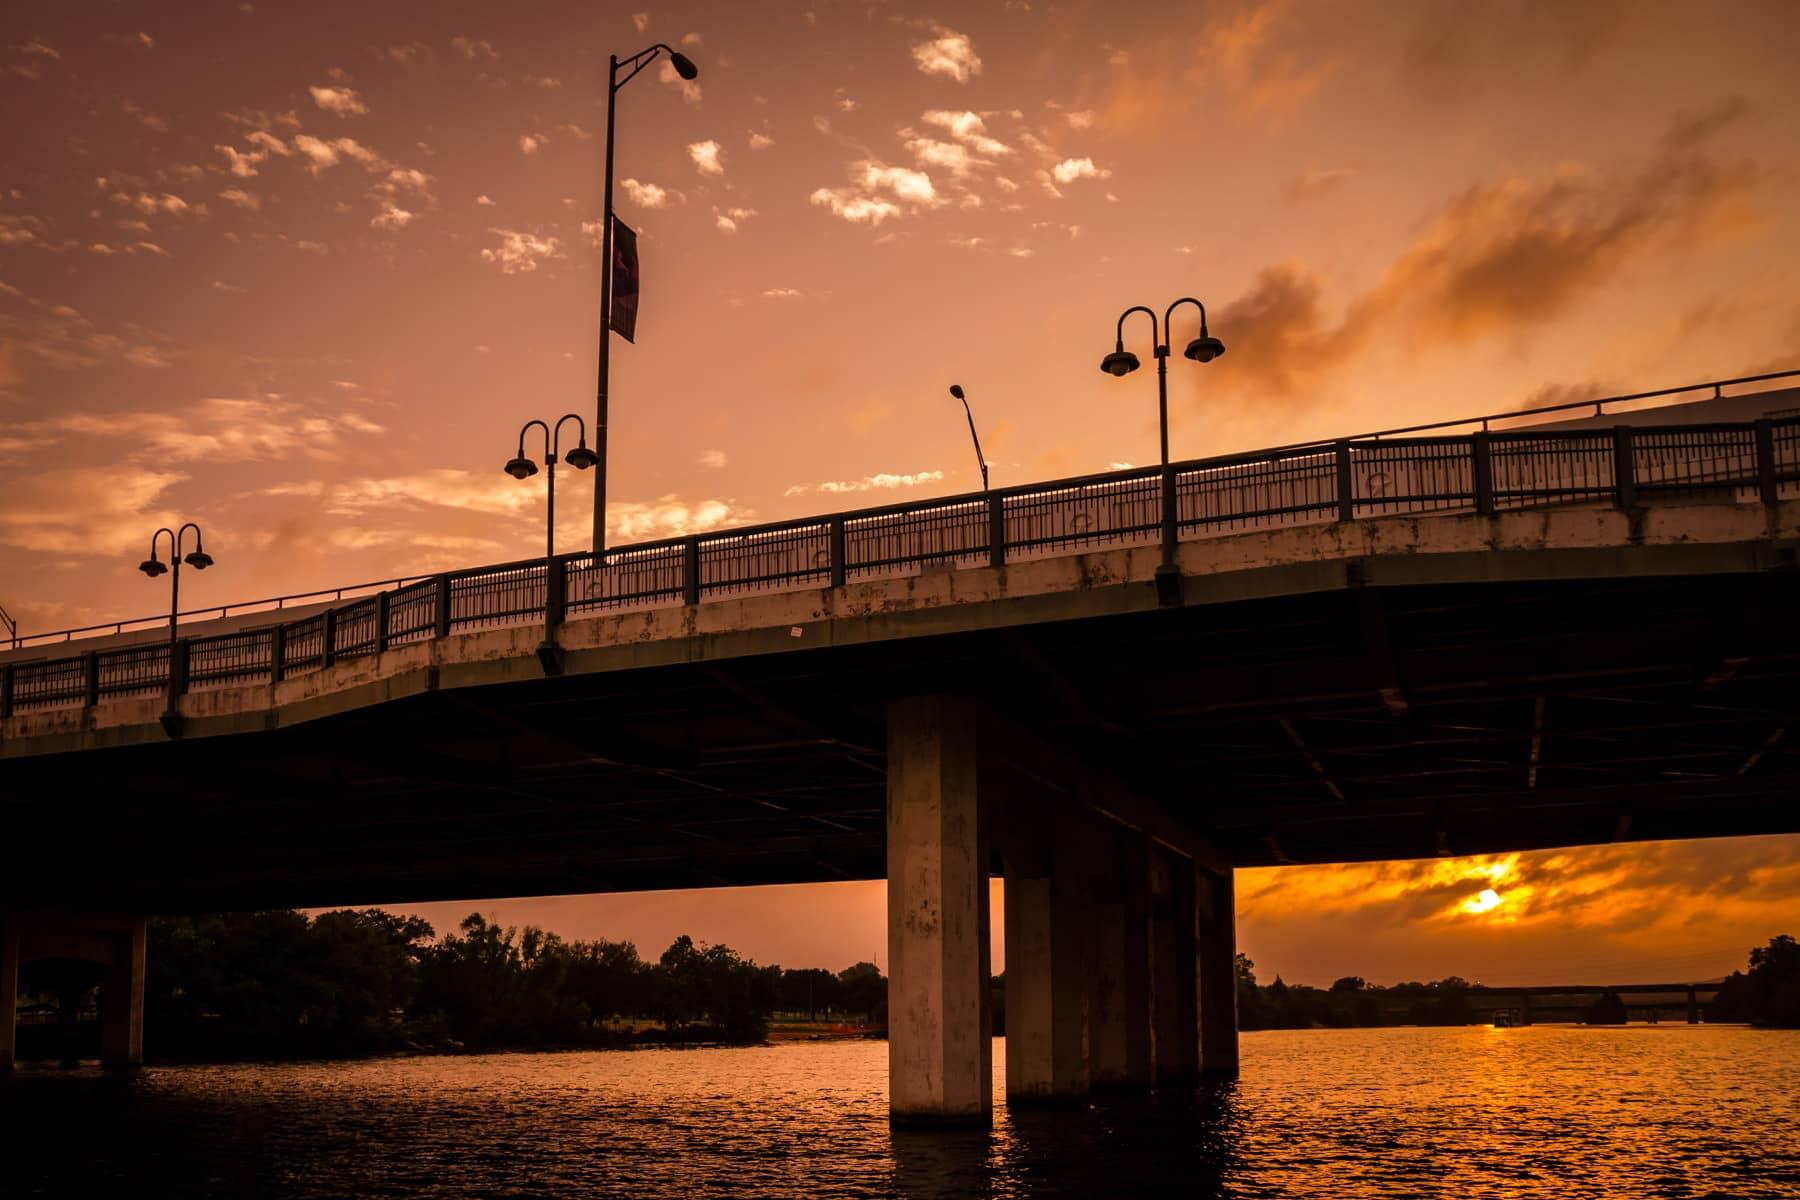 The sun sets on Austin's South First Street Bridge as it spans Lady Bird Lake.